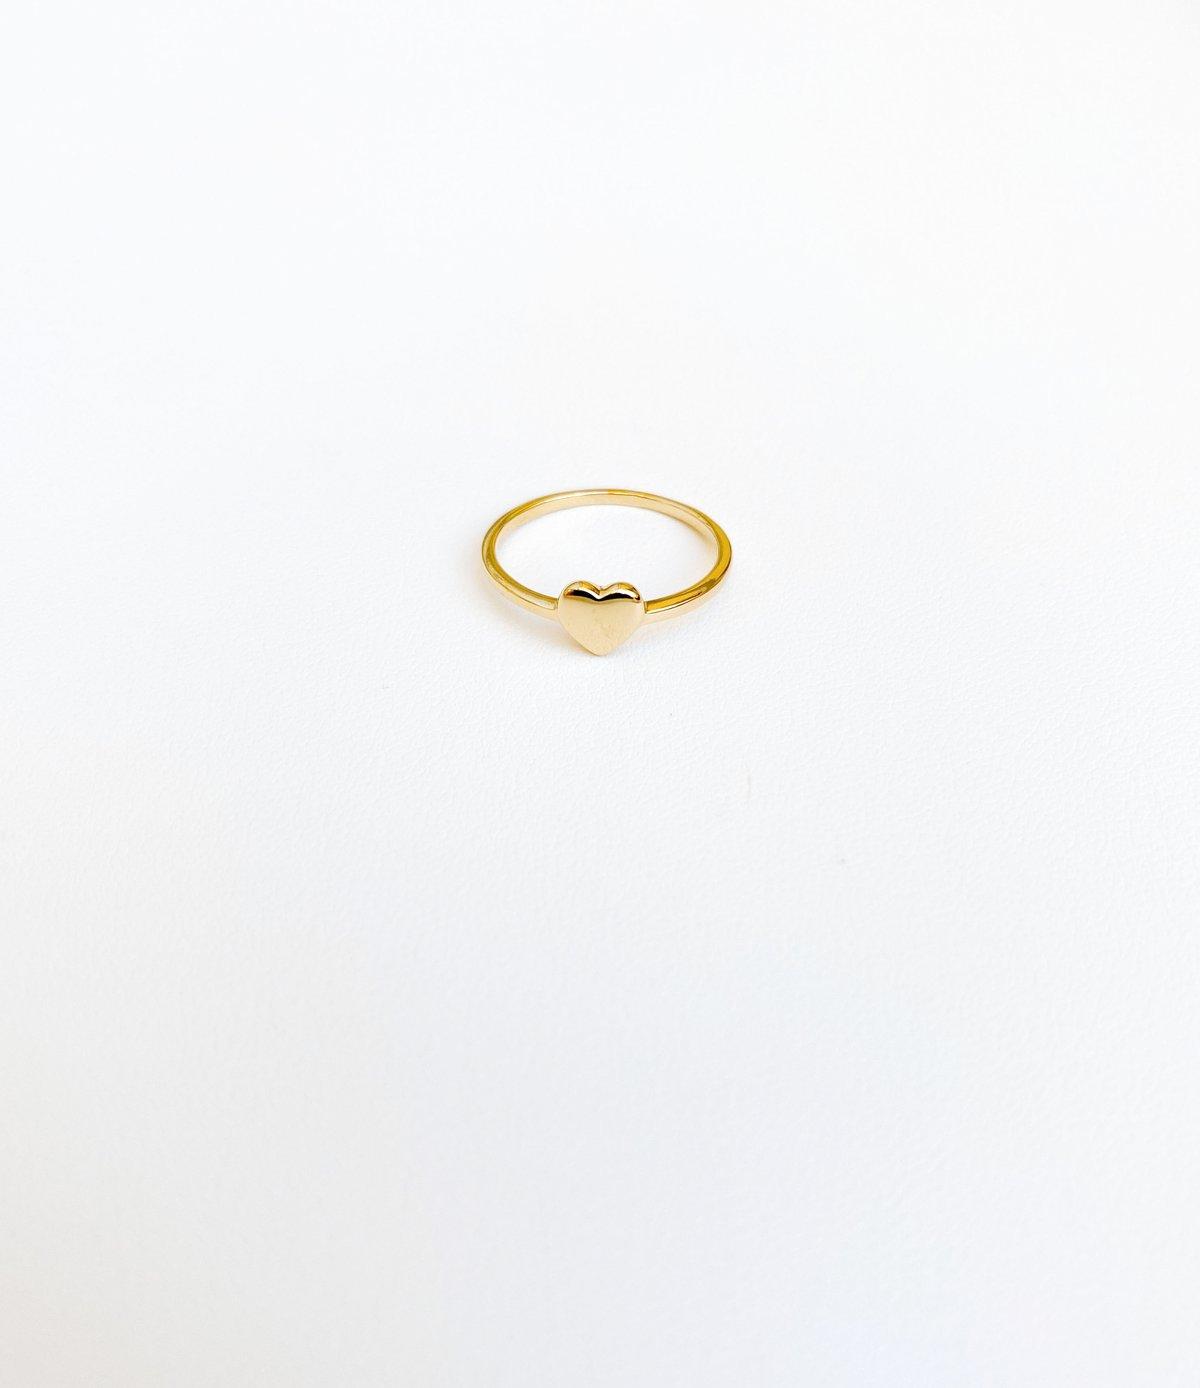 Image of GOLDEN HEART | RING